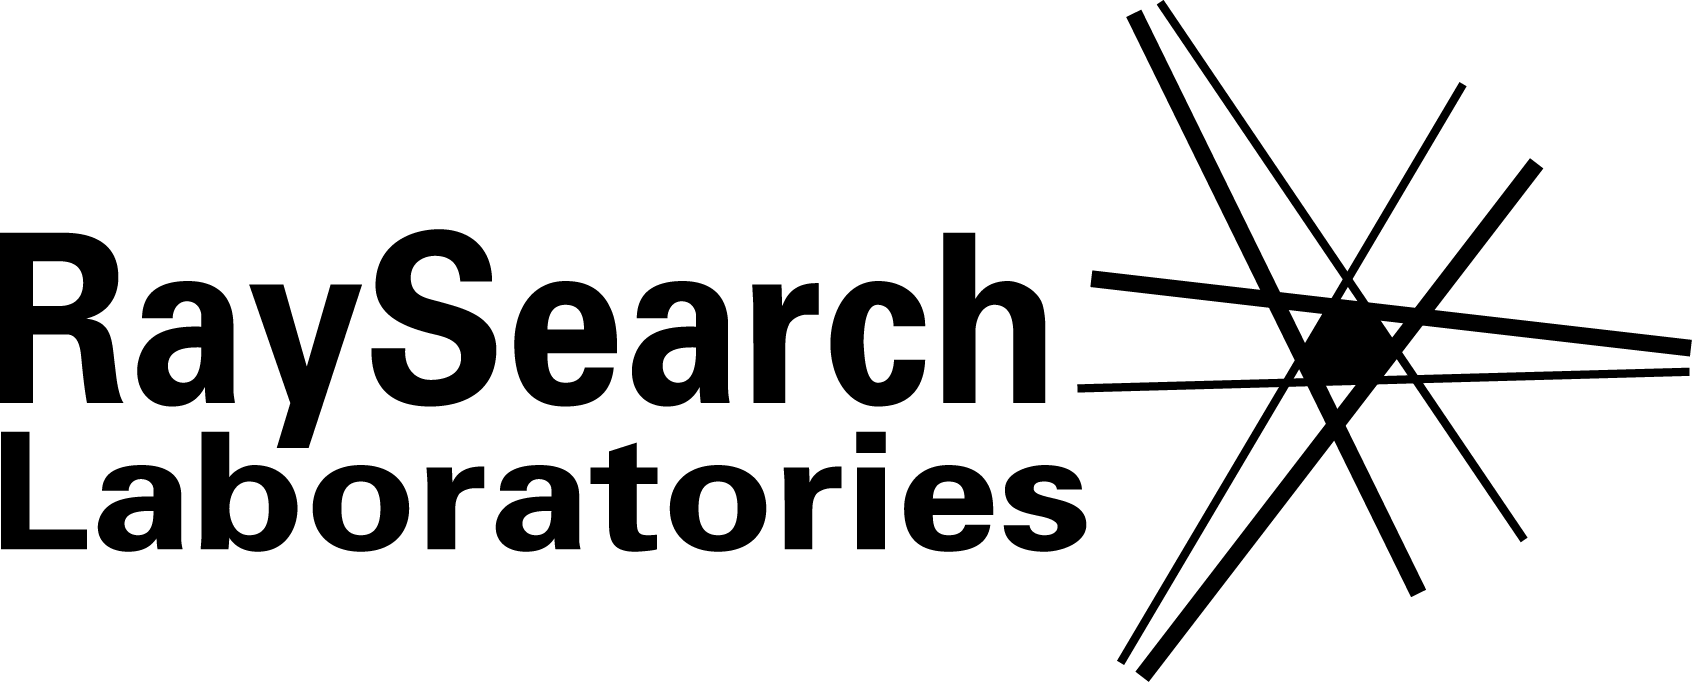 RaySearch_logotype_black.png